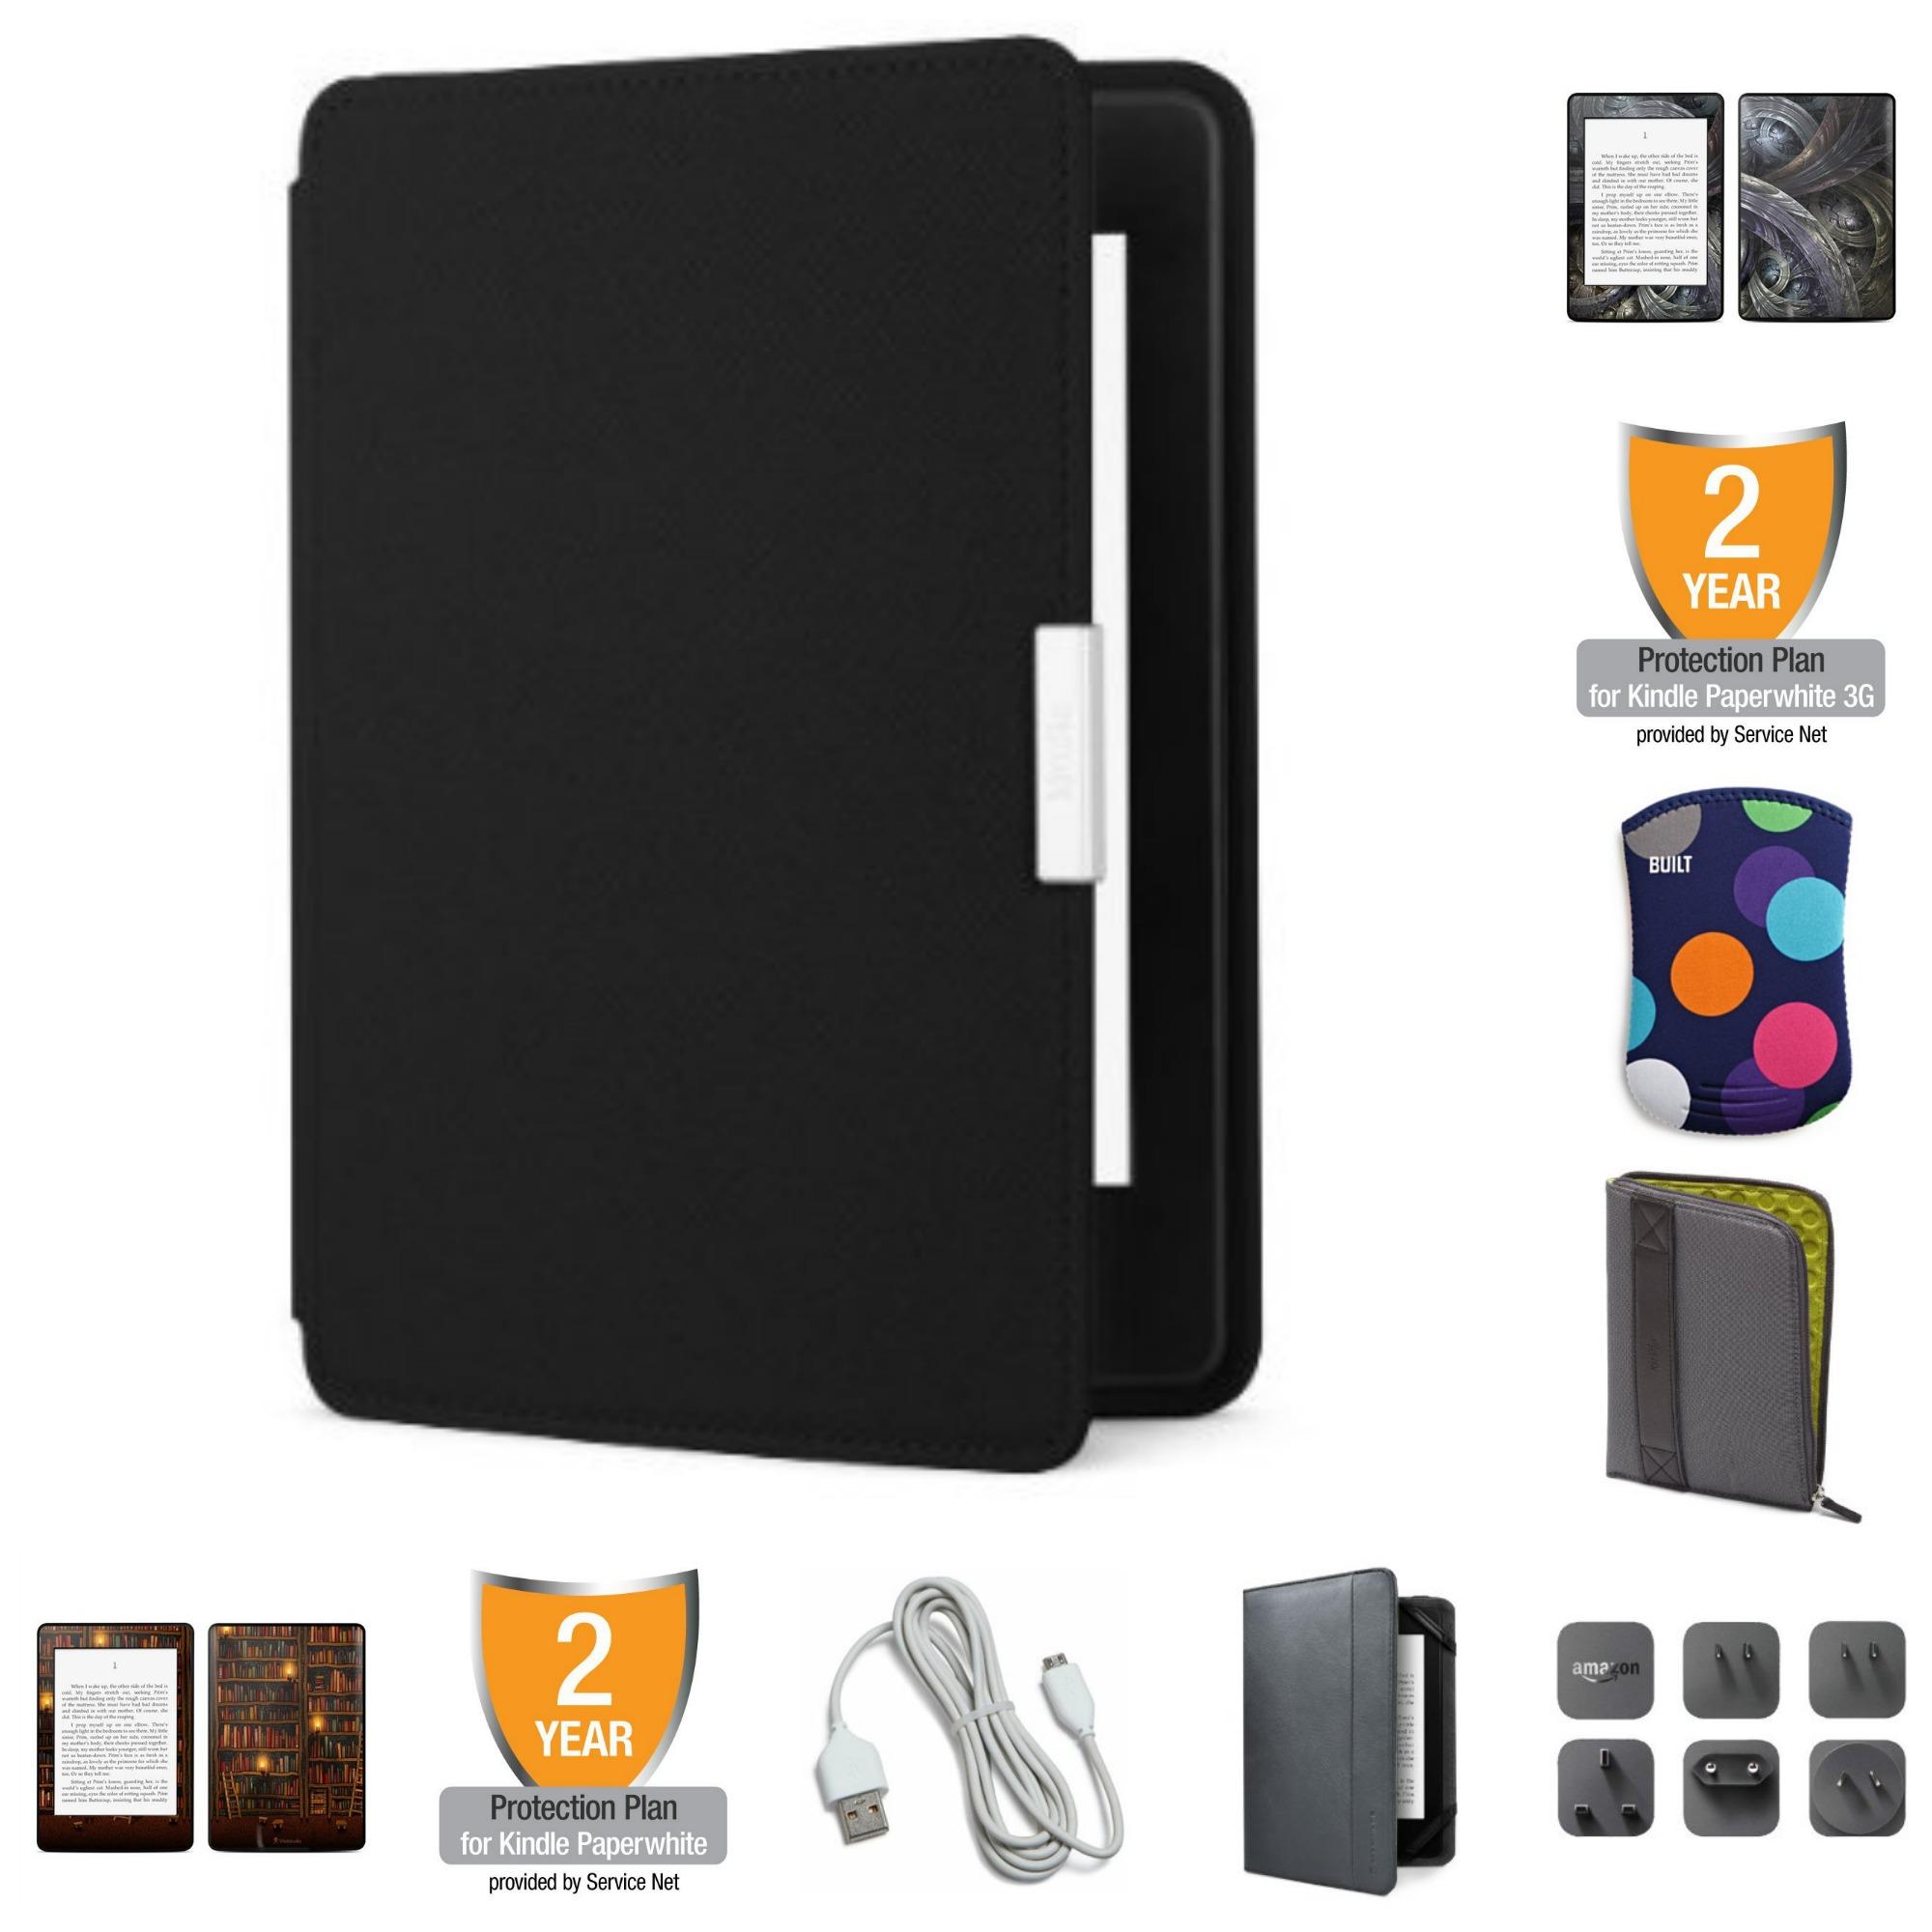 Kindle Paperwhite Accessories (Amazon US)